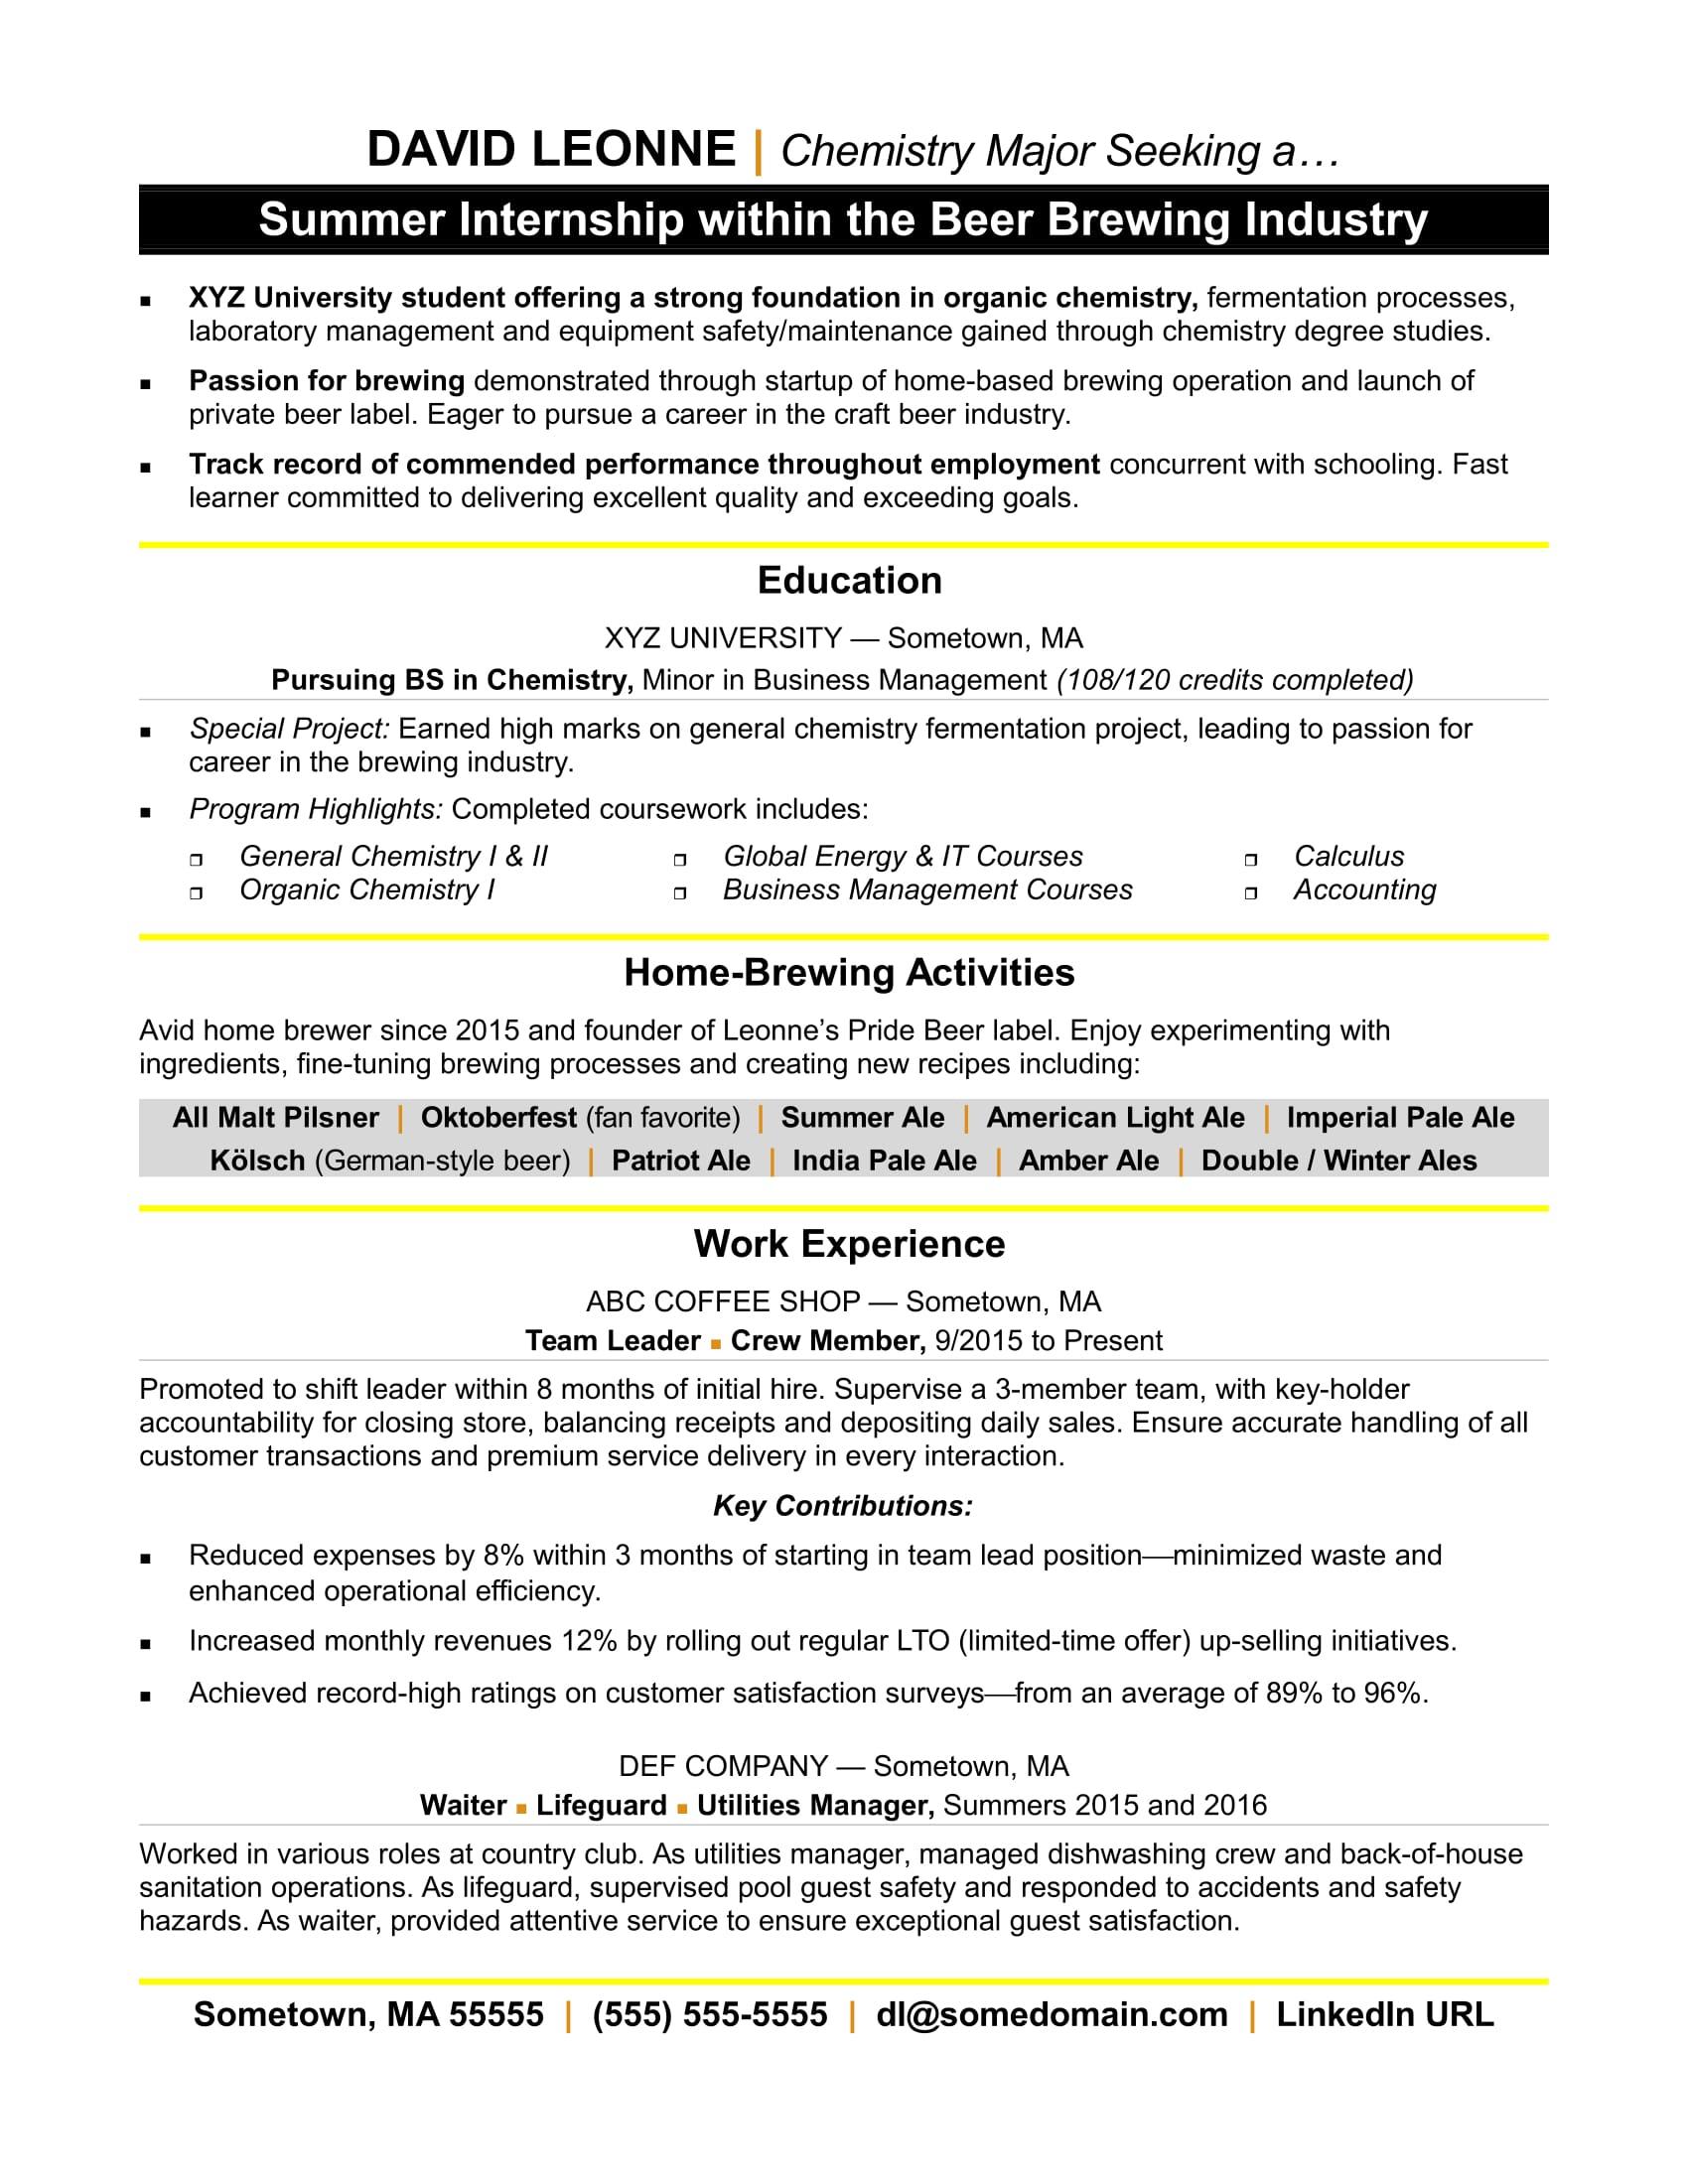 internship experience resume sample